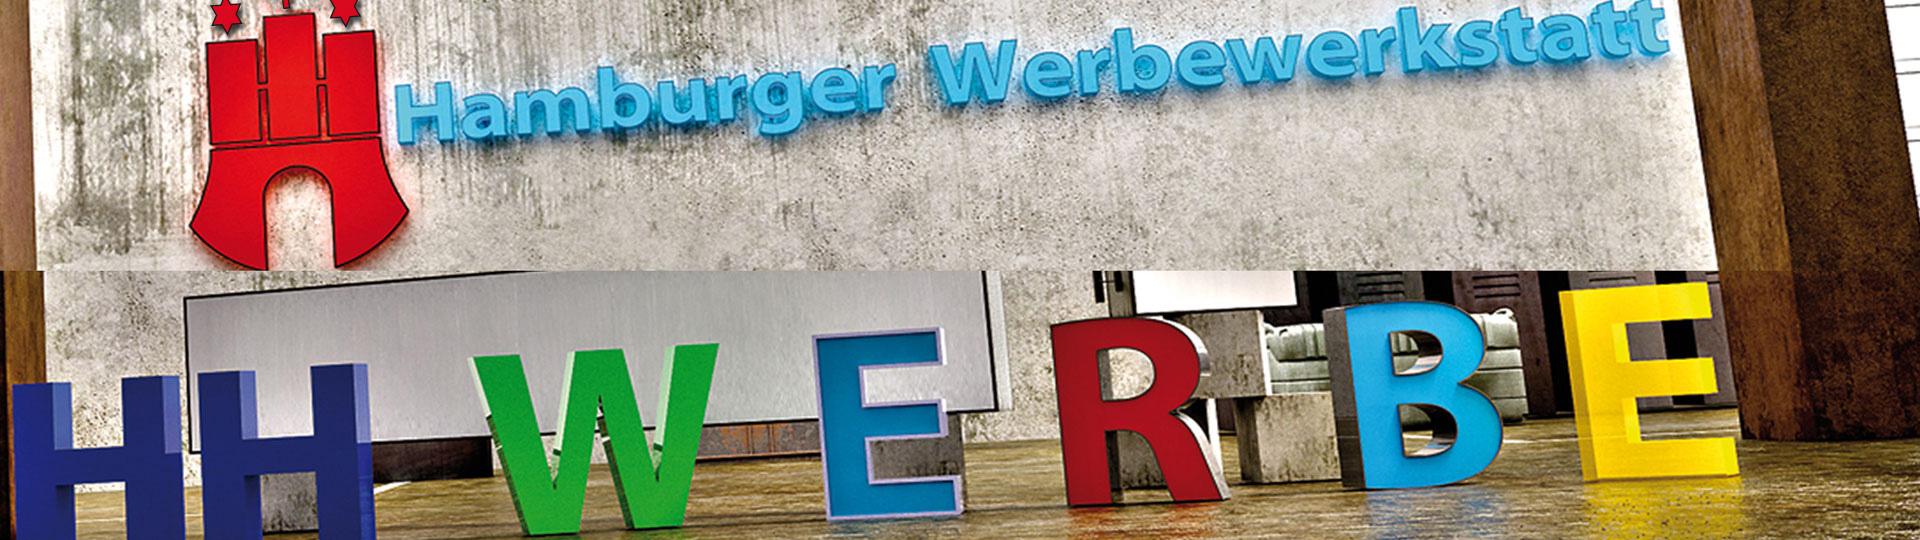 Hamburgerwerbewerkstatt_slide1b